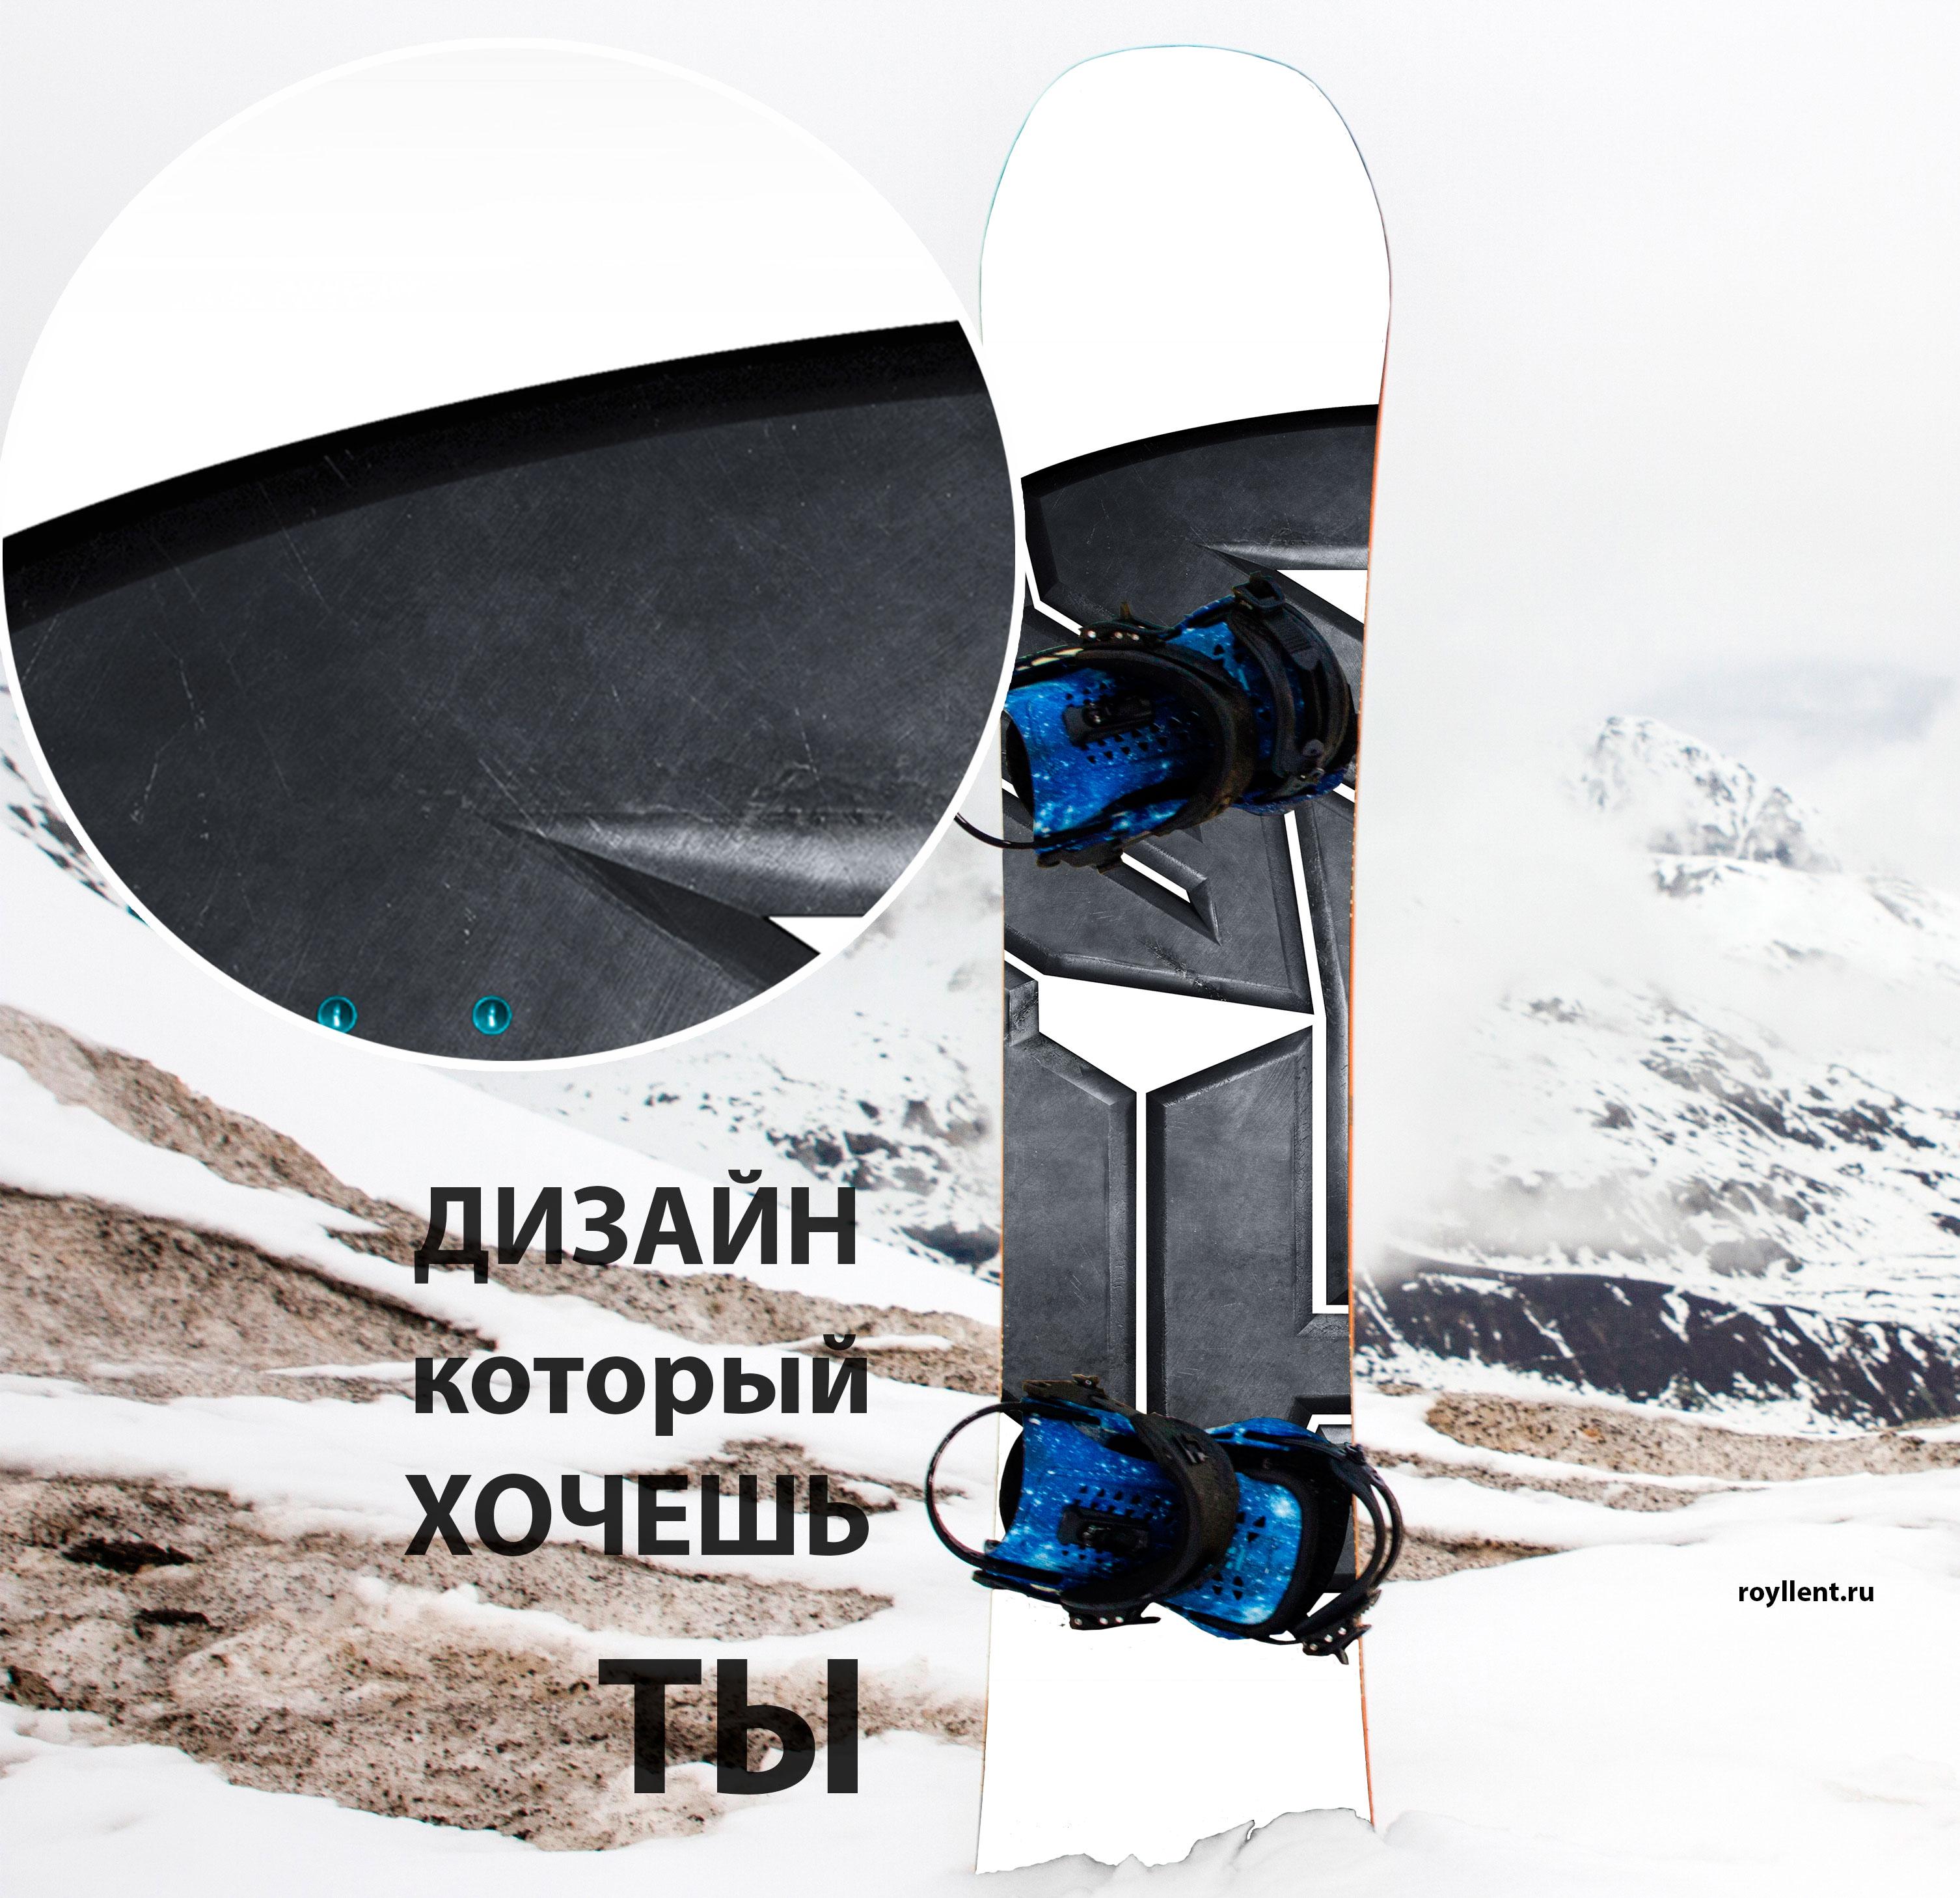 Дизайн сноуборда в стиле Автоботов лого